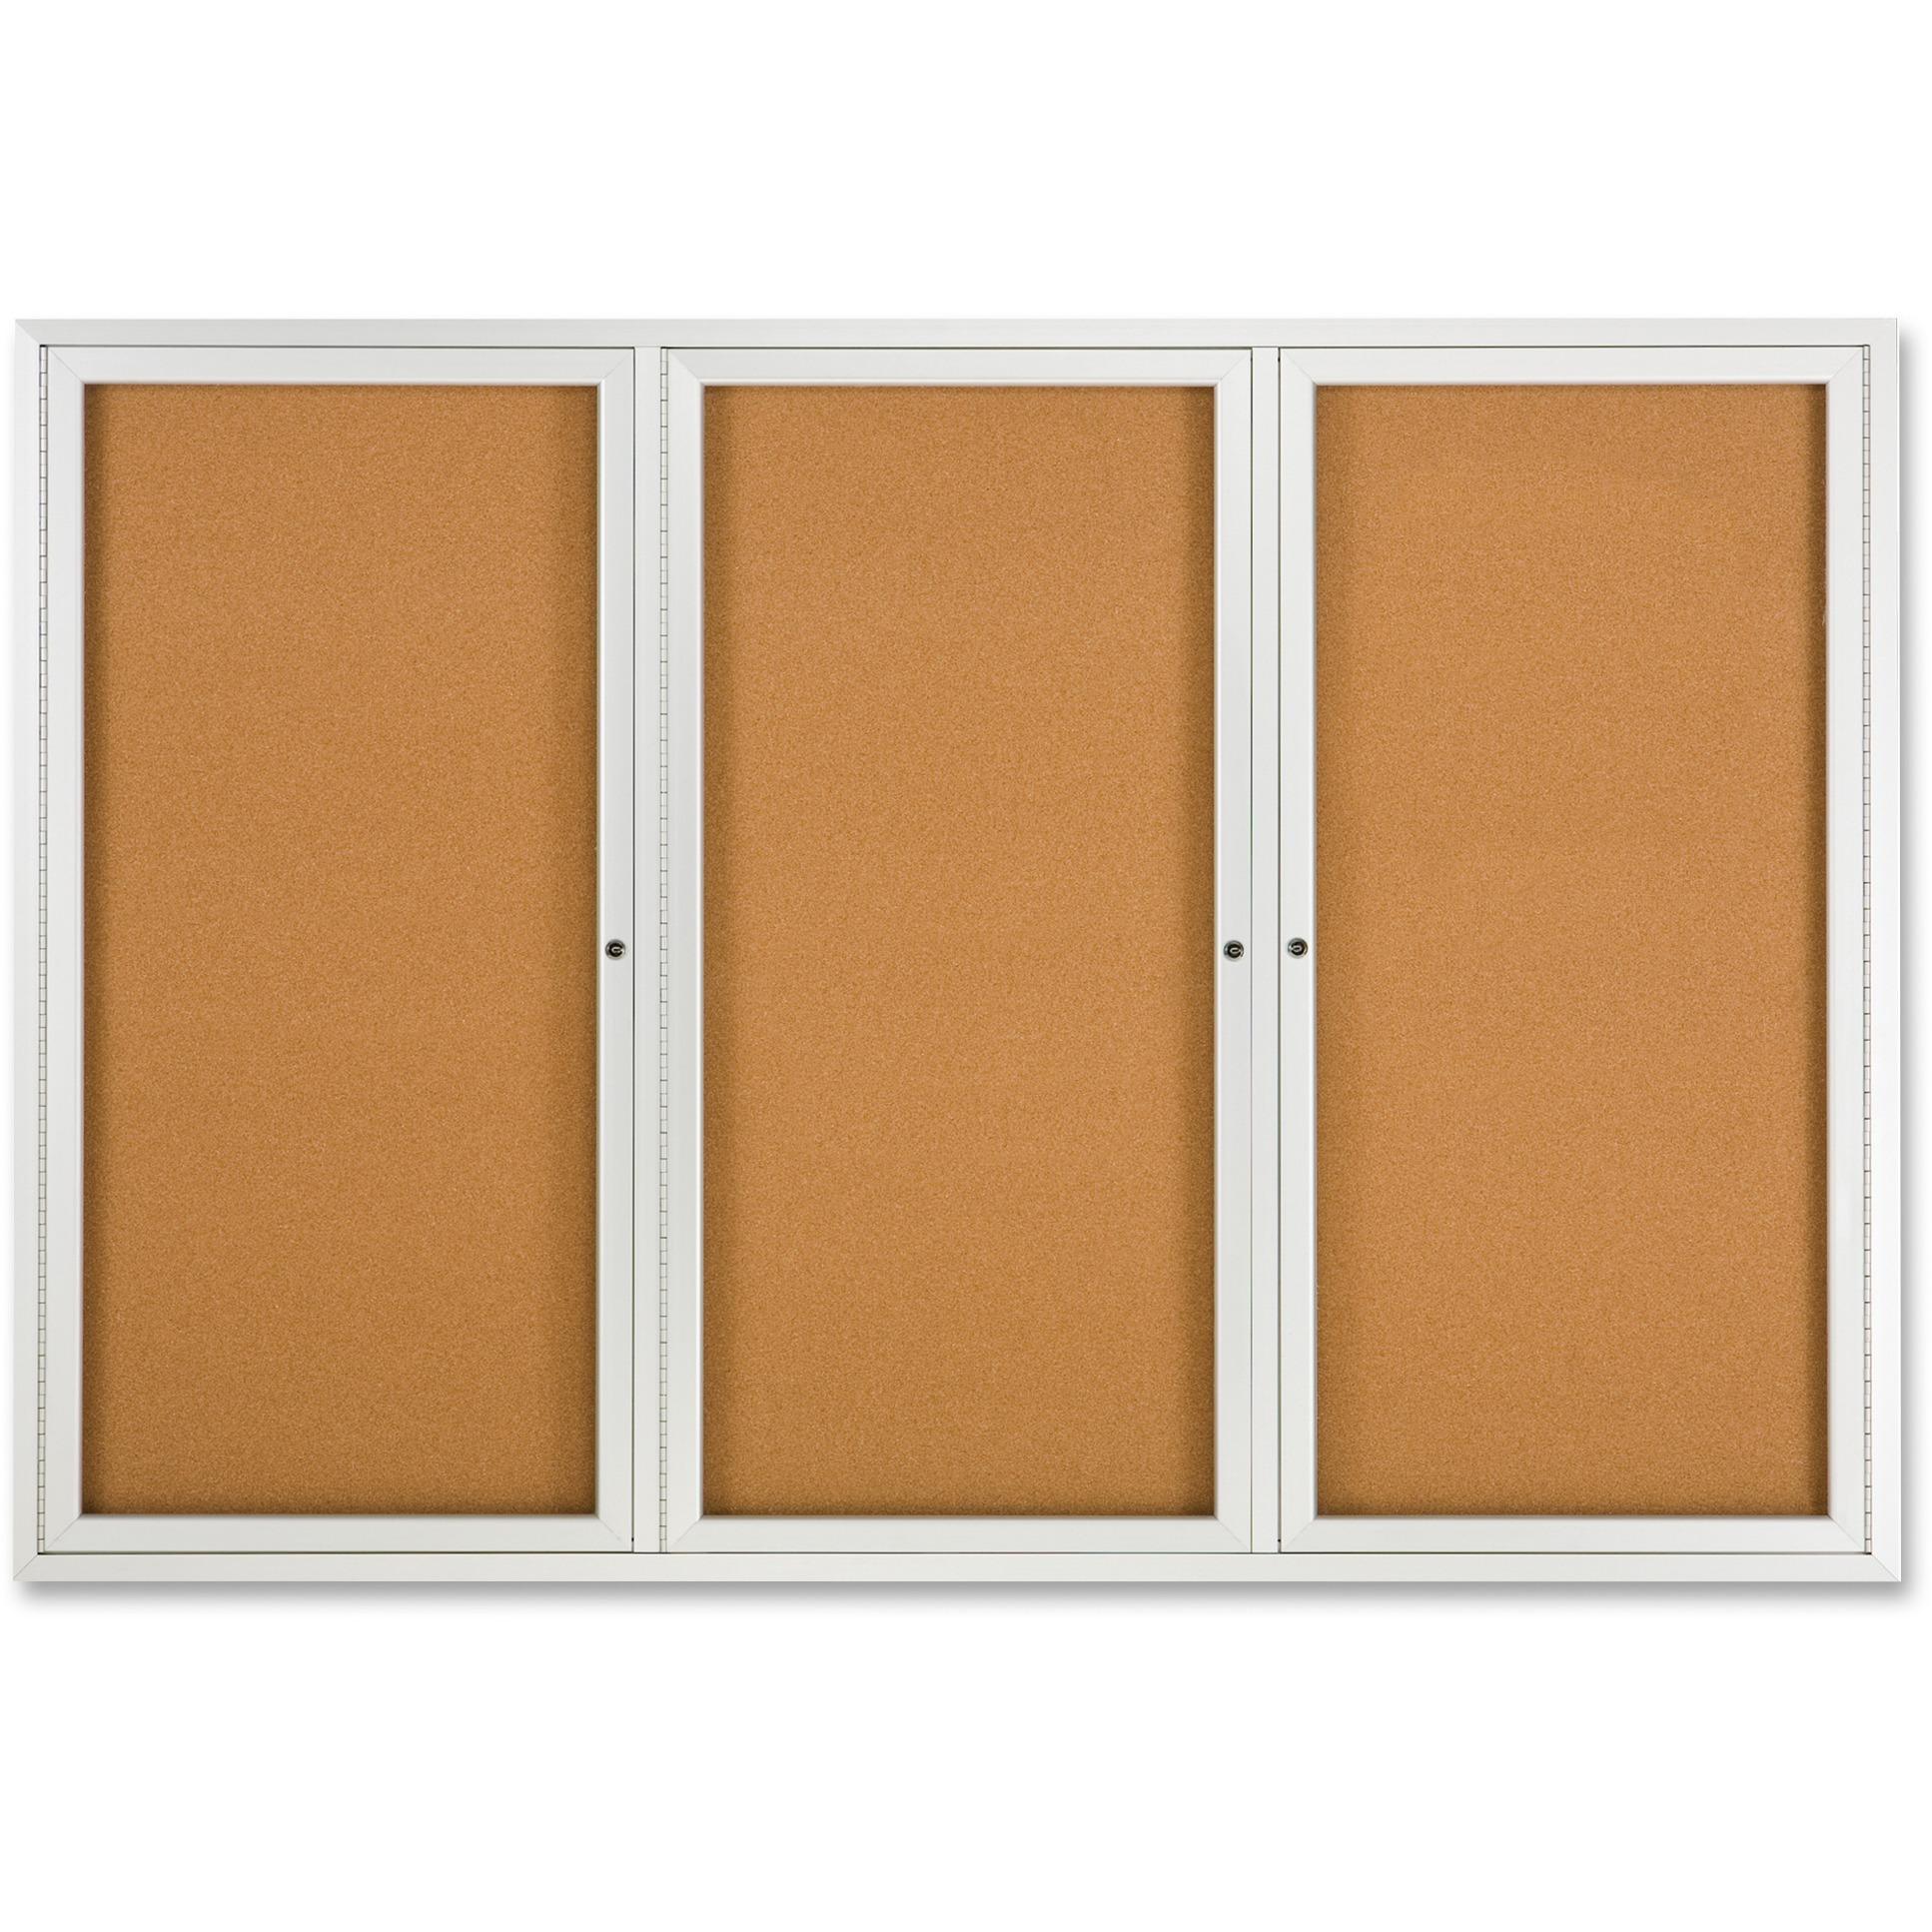 Quartet, QRT2367, Framed 3-door Enclosed Cork Bulletin Brd, 1 / Each